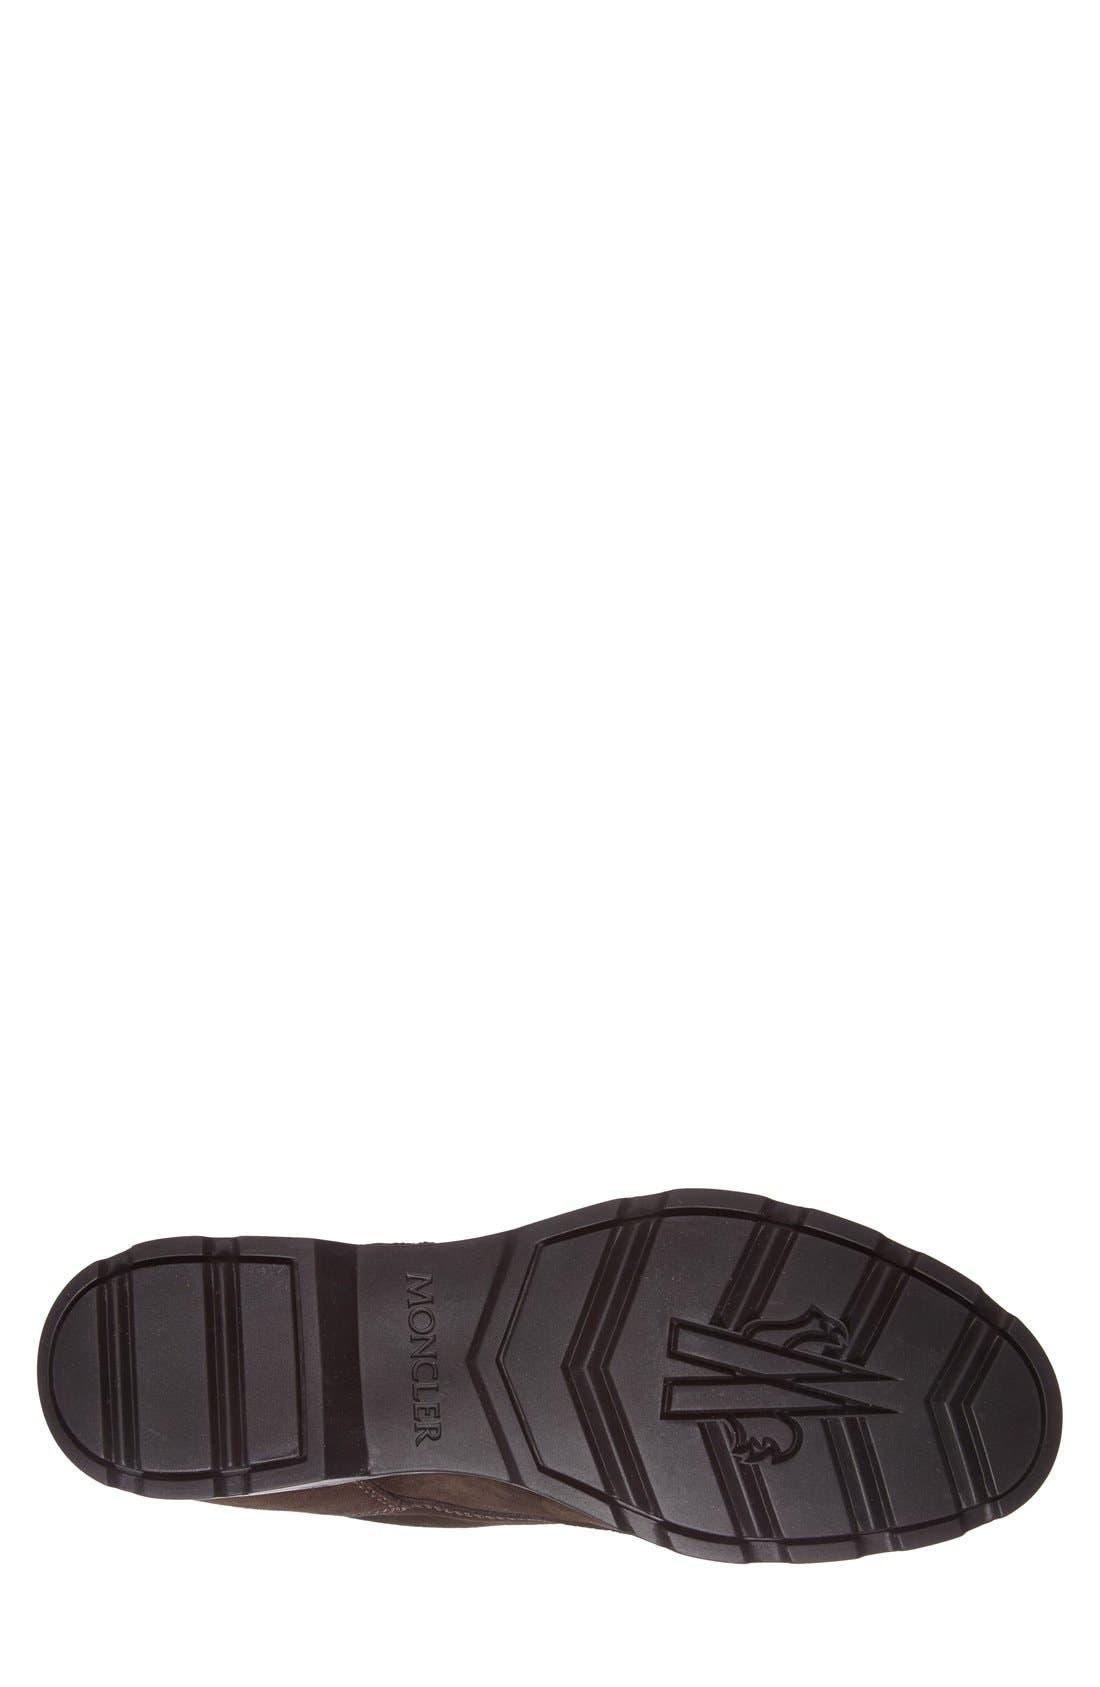 Alternate Image 4  - Moncler 'Vancouver' Plain Toe Boot (Men)